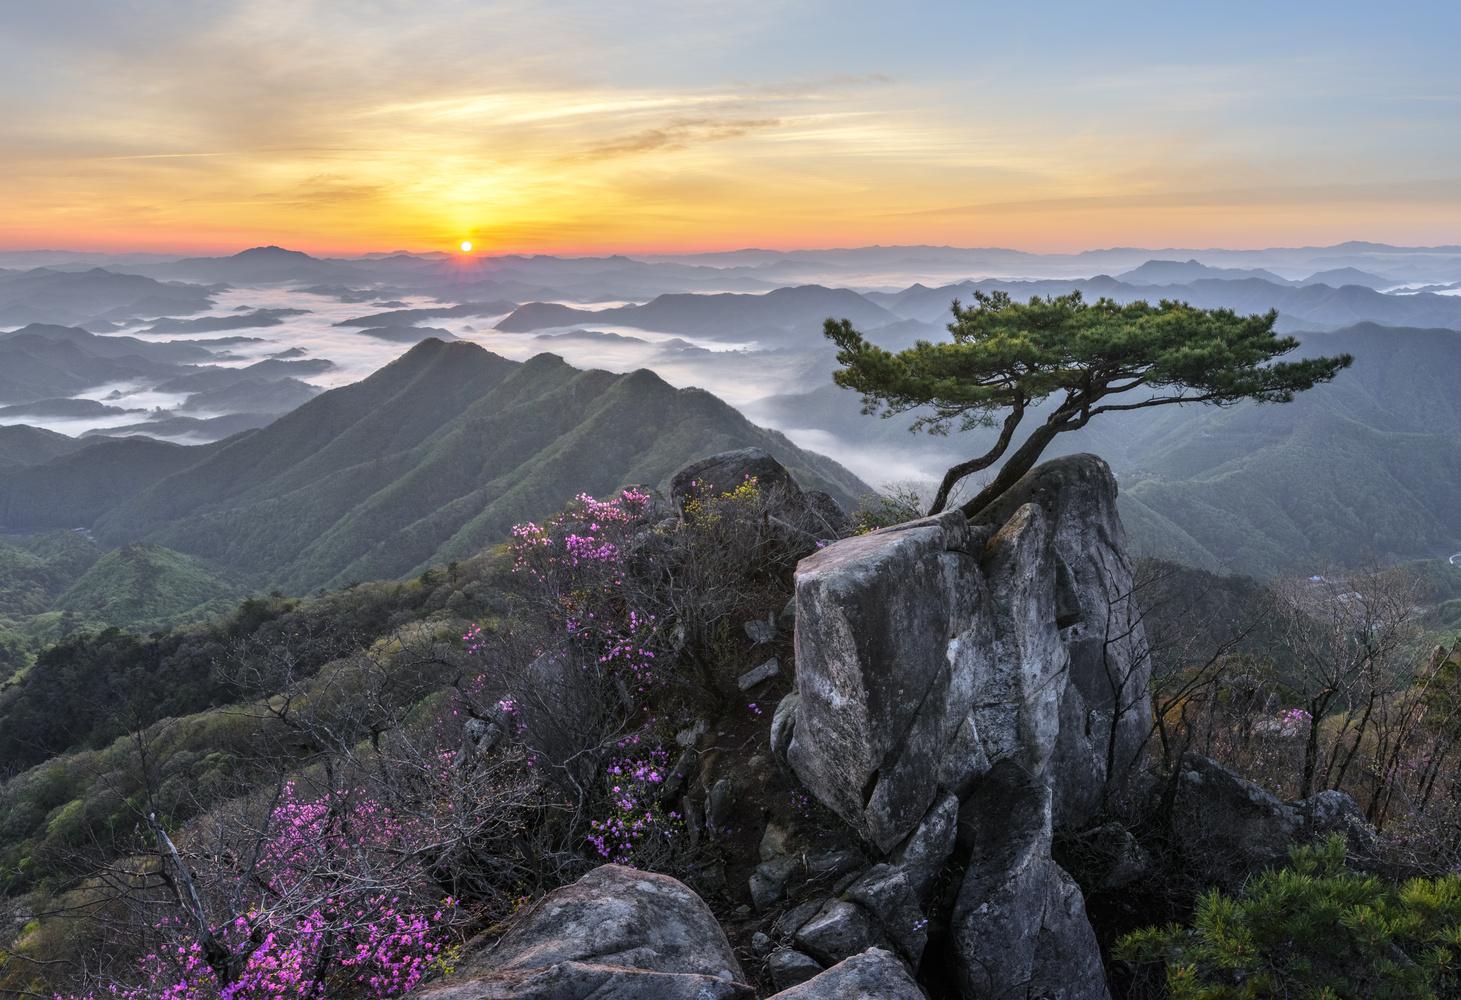 Pine tree growing between rocks by jaeyoun Ryu